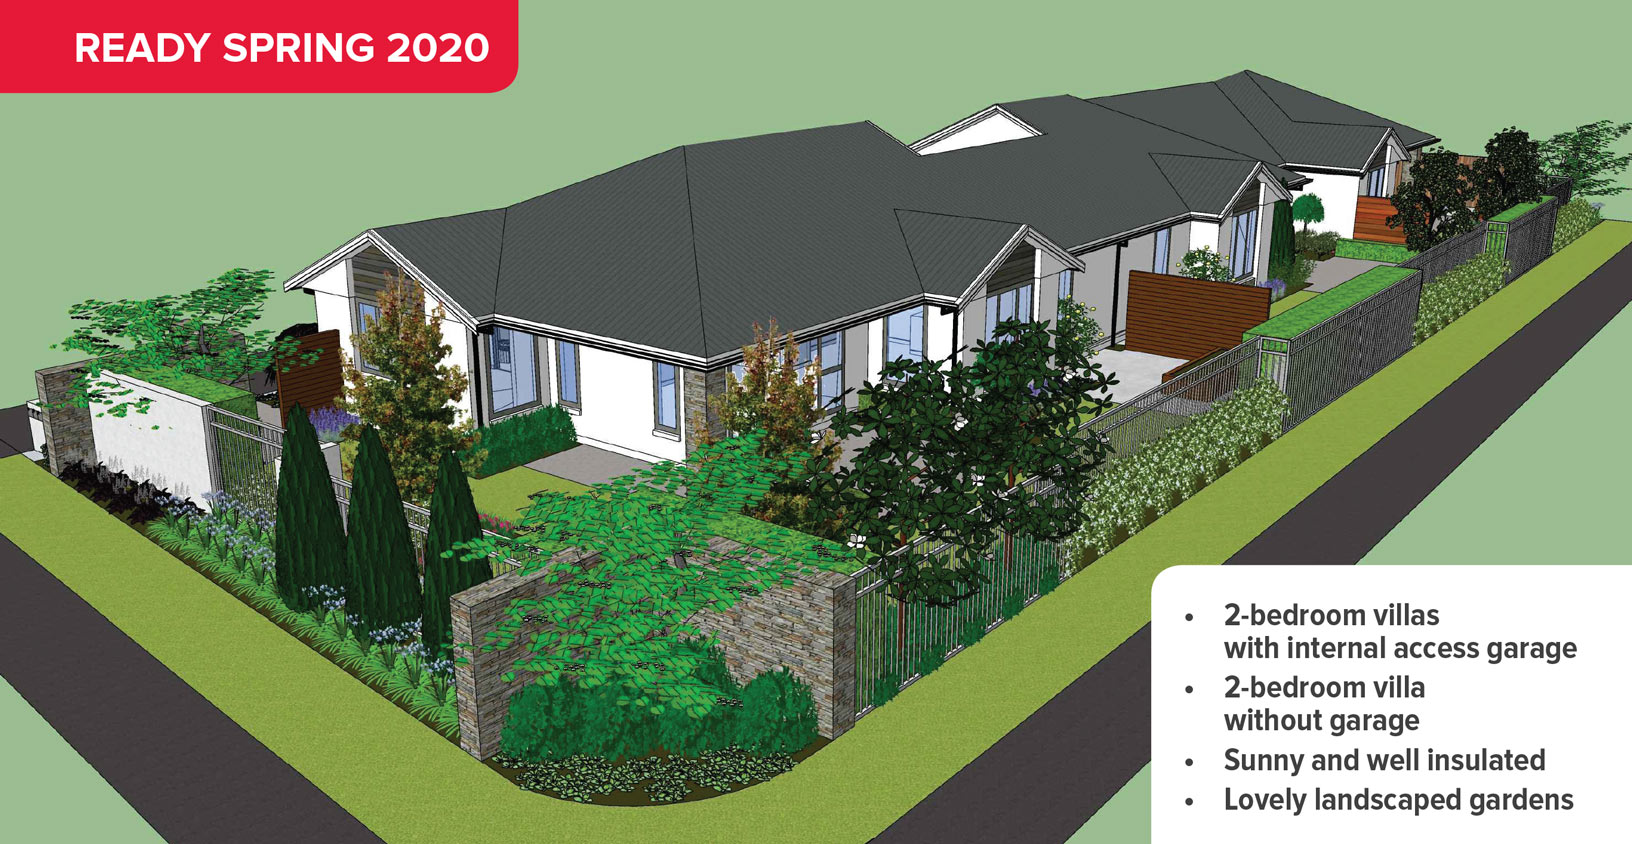 New high-quality Thorrington villas